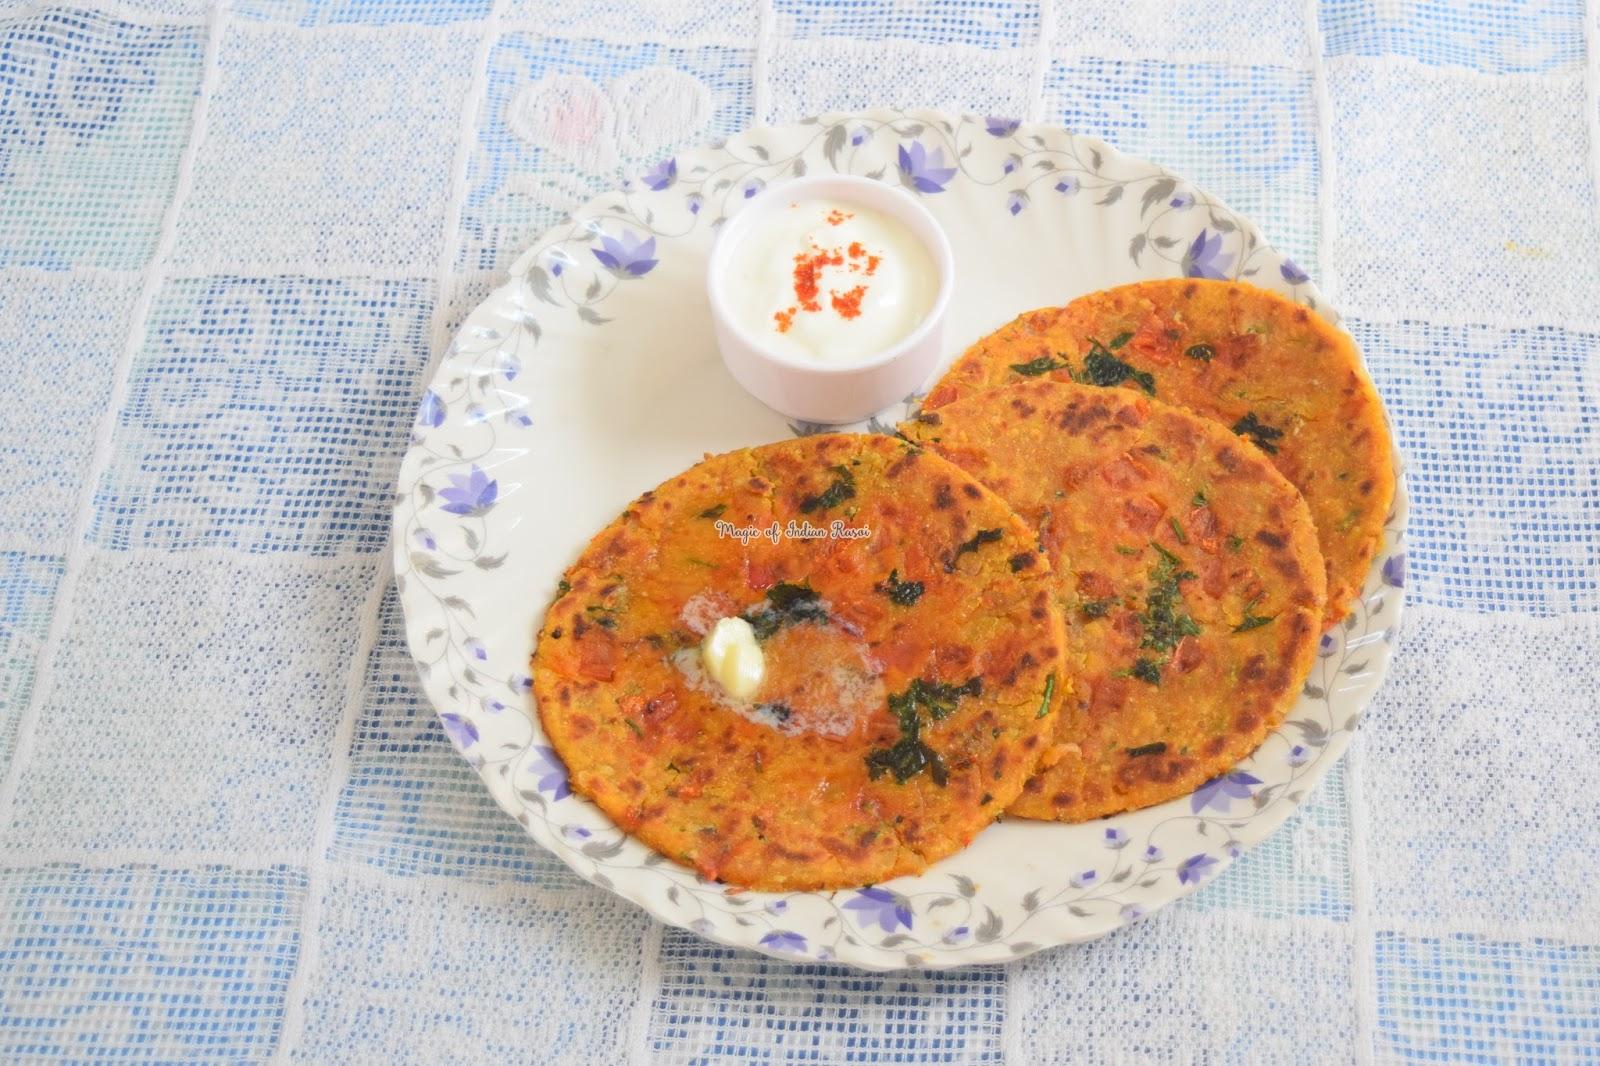 Rajasthani Tikkar Paratha - Pyaaz Tamatar Tikkar Recipe - राजस्थानी टिक्कर पराठा रेसिपी - Priya R - Magic of Indian Rasoi